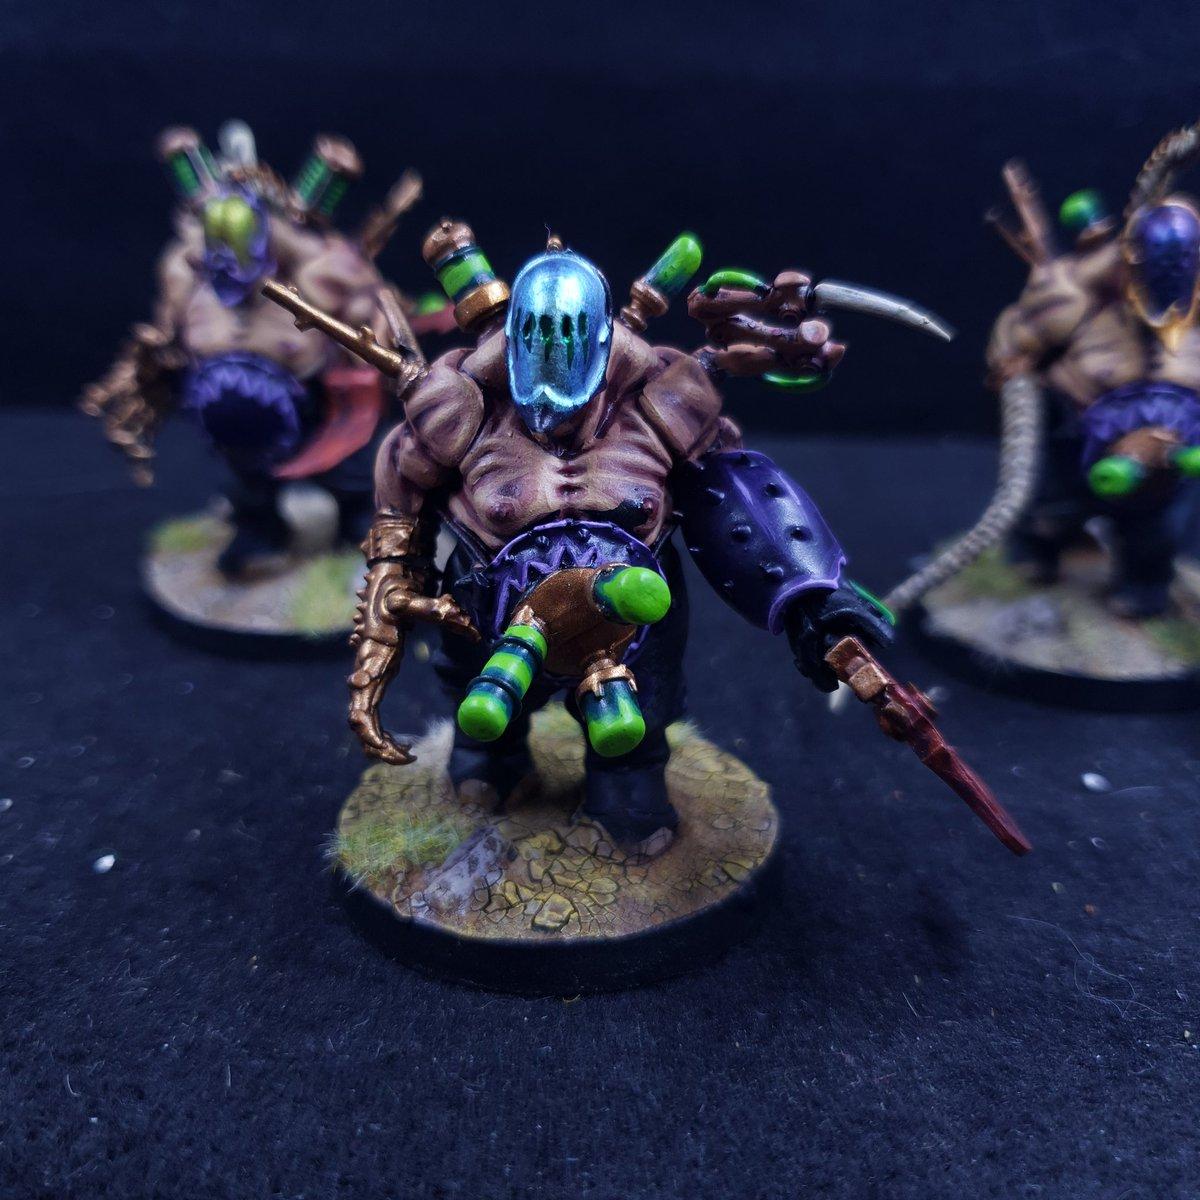 My Haemonuculus coven! DONE #warhammer40k #wh40k #PaintingWarhammer #WarhammerCommunity @WarComTeam #Hobby https://t.co/uZUavj8hjV